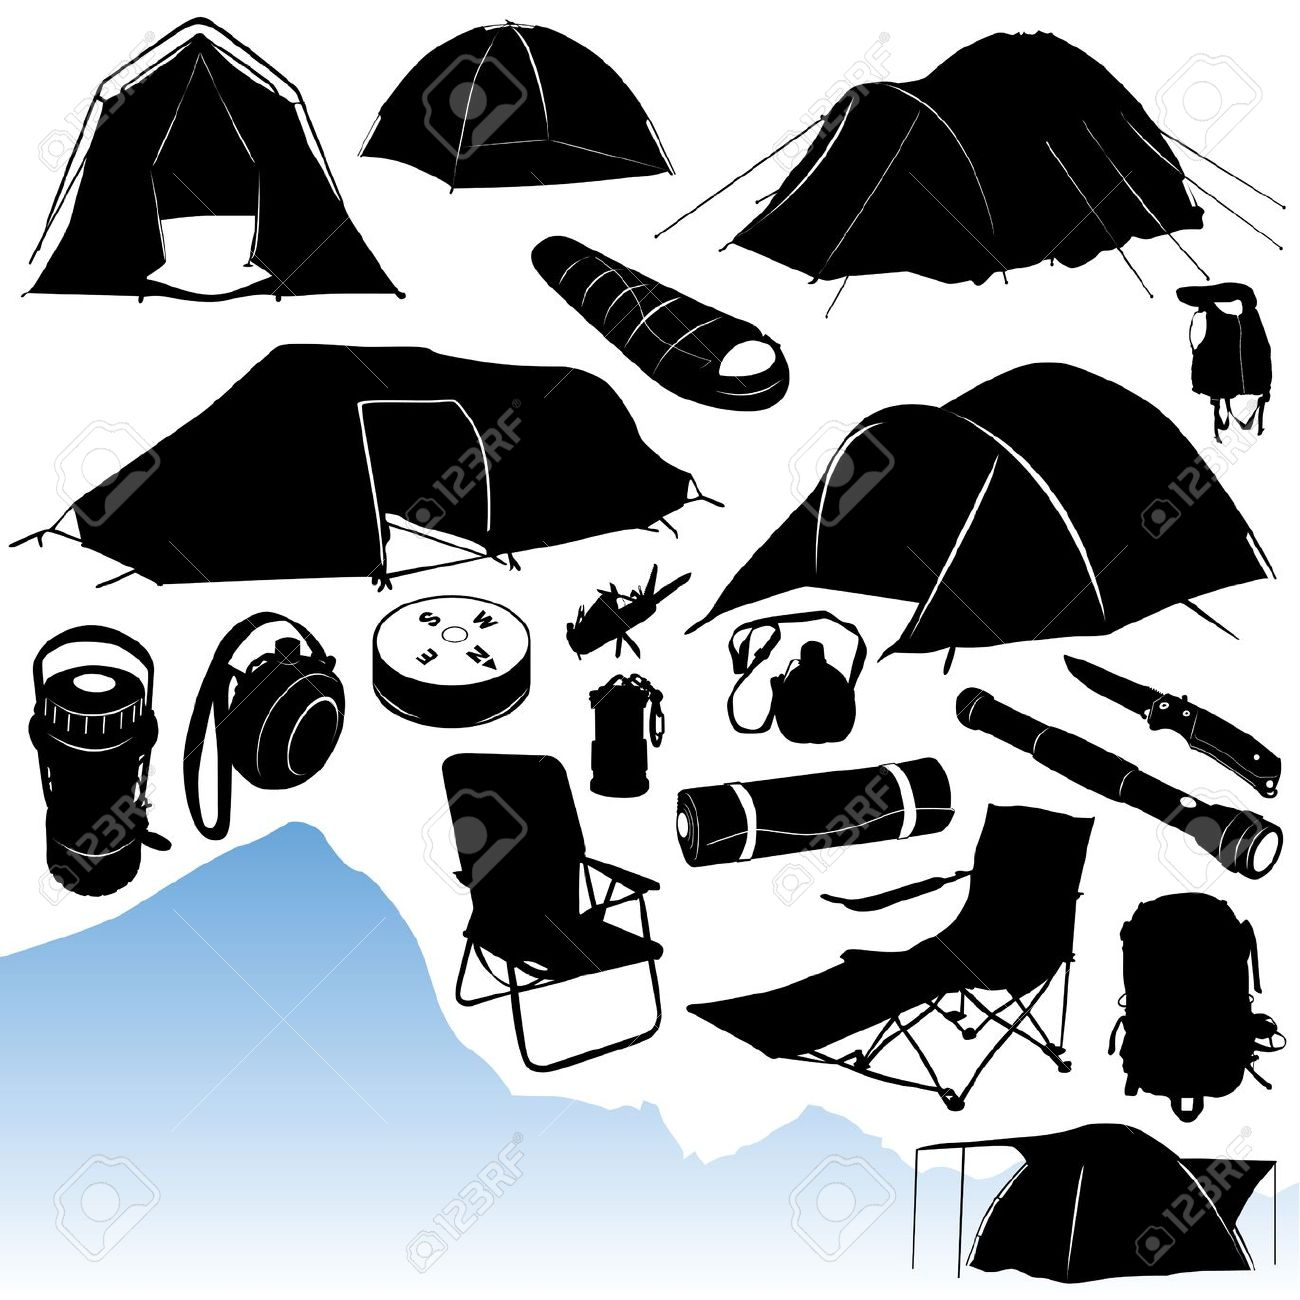 Camping Vector Royalty Free Cliparts, Vectors, And Stock.